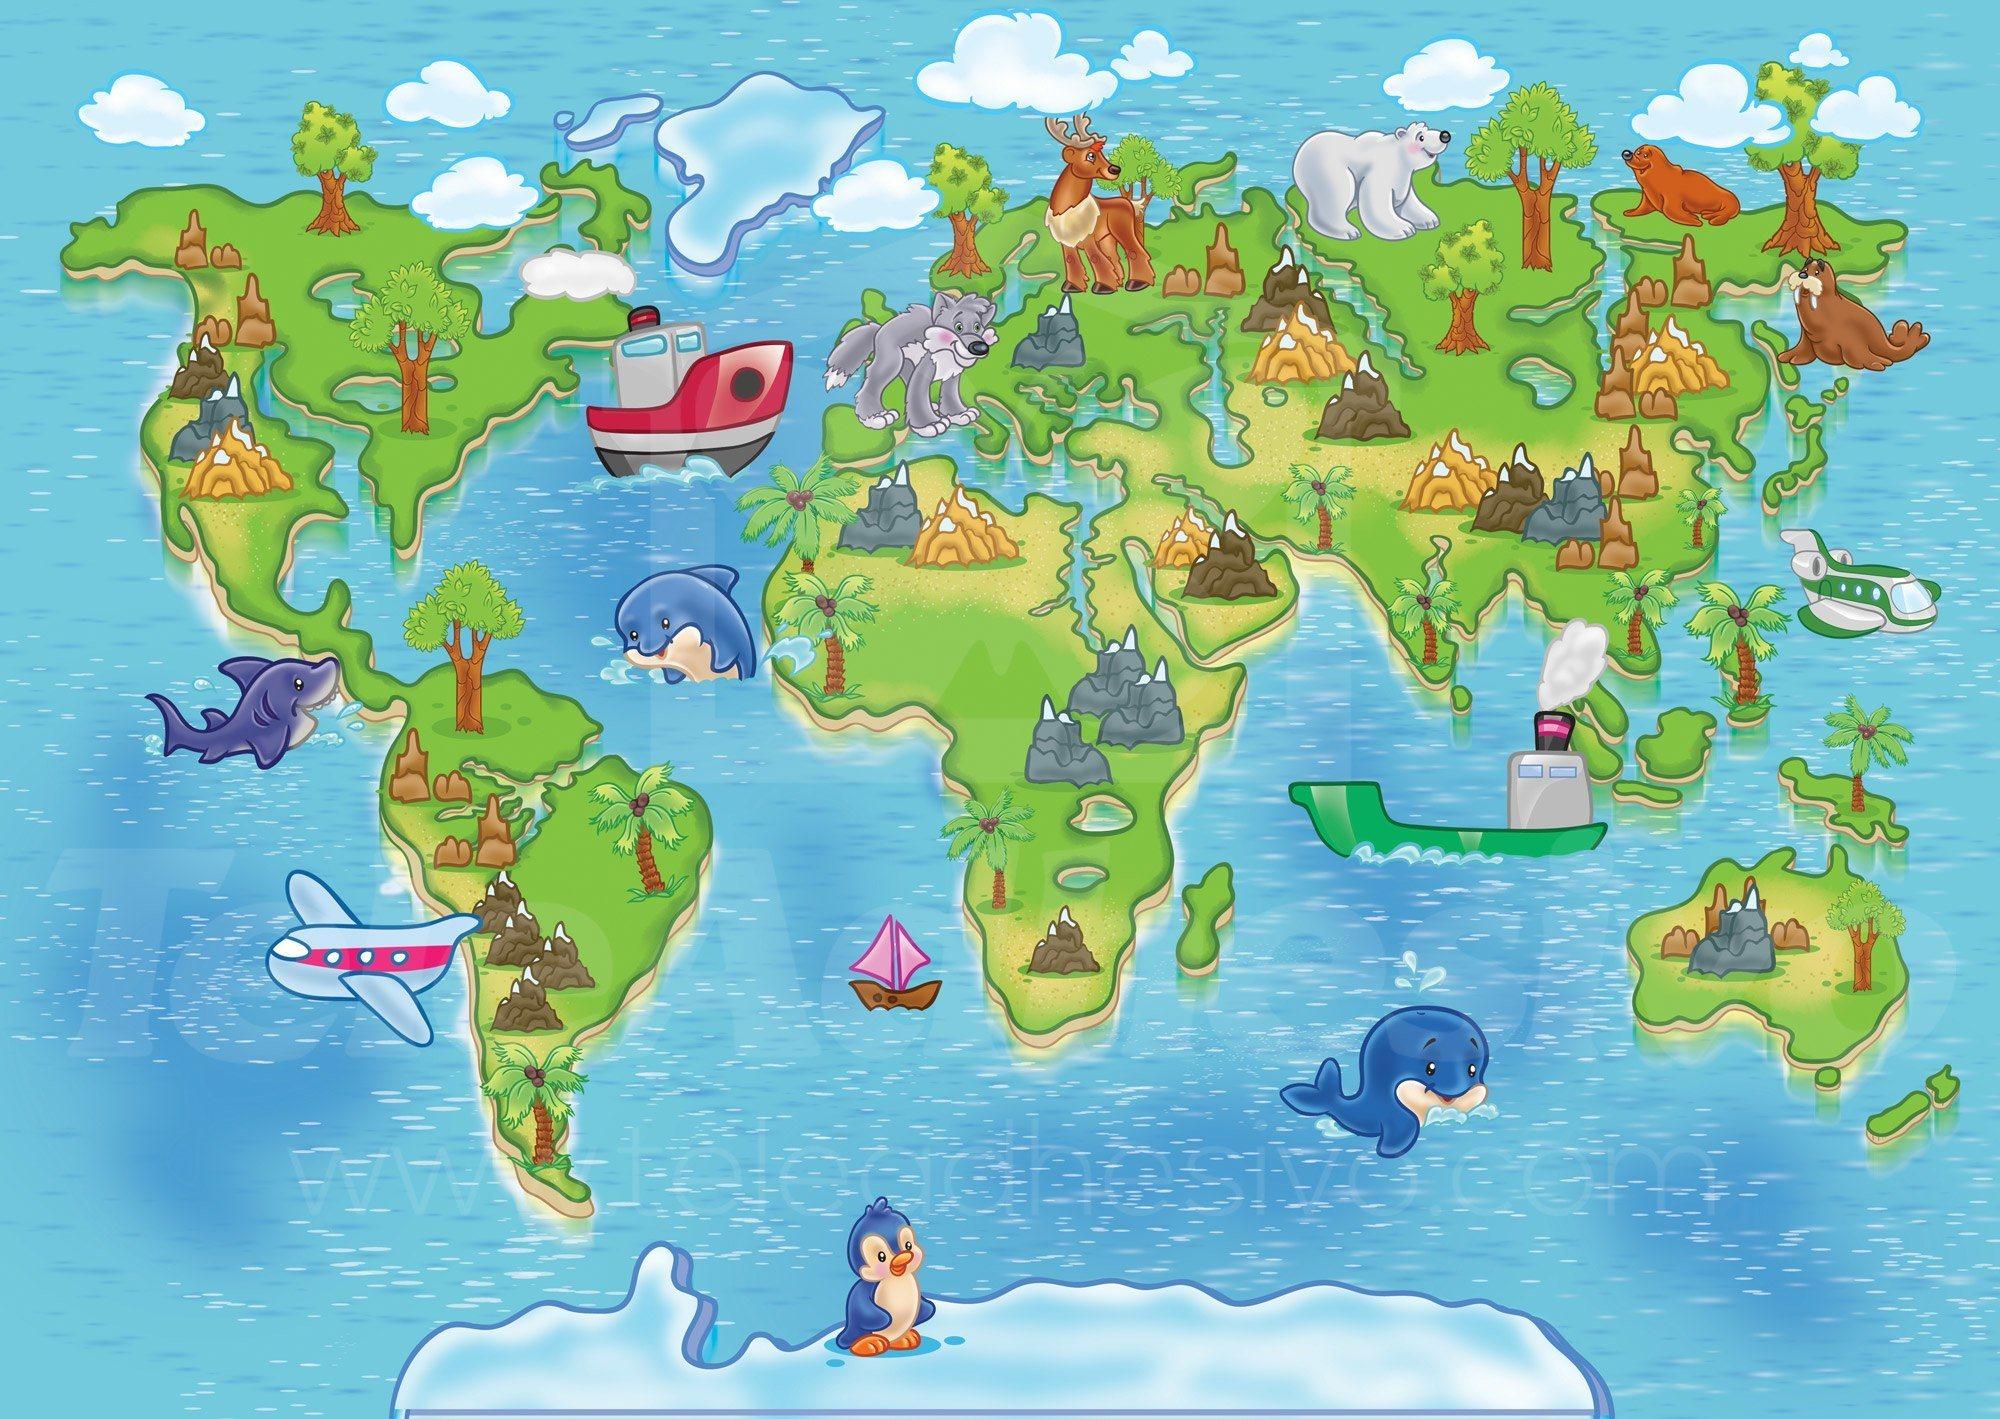 Fototapeten: Kinderweltkarte 3